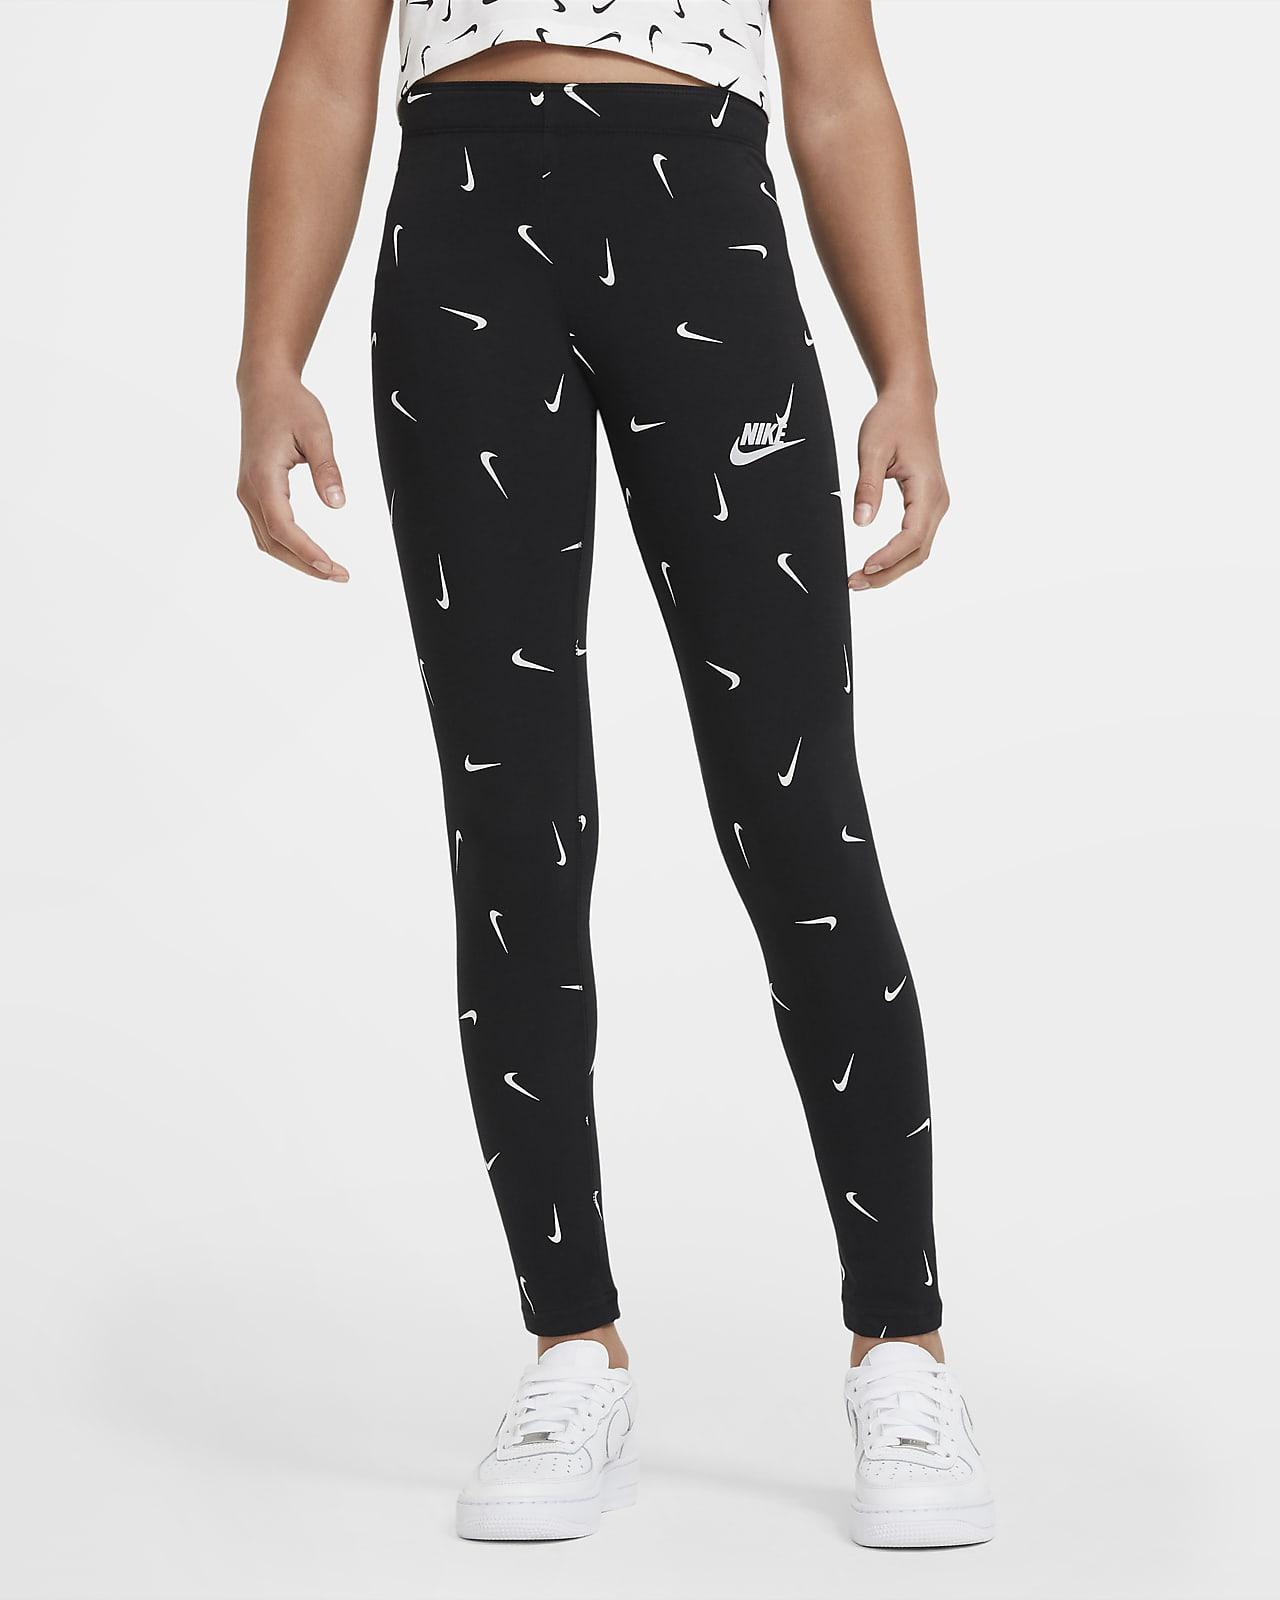 Nike Sportswear Favorites Big Kids' (Girls') Printed Leggings